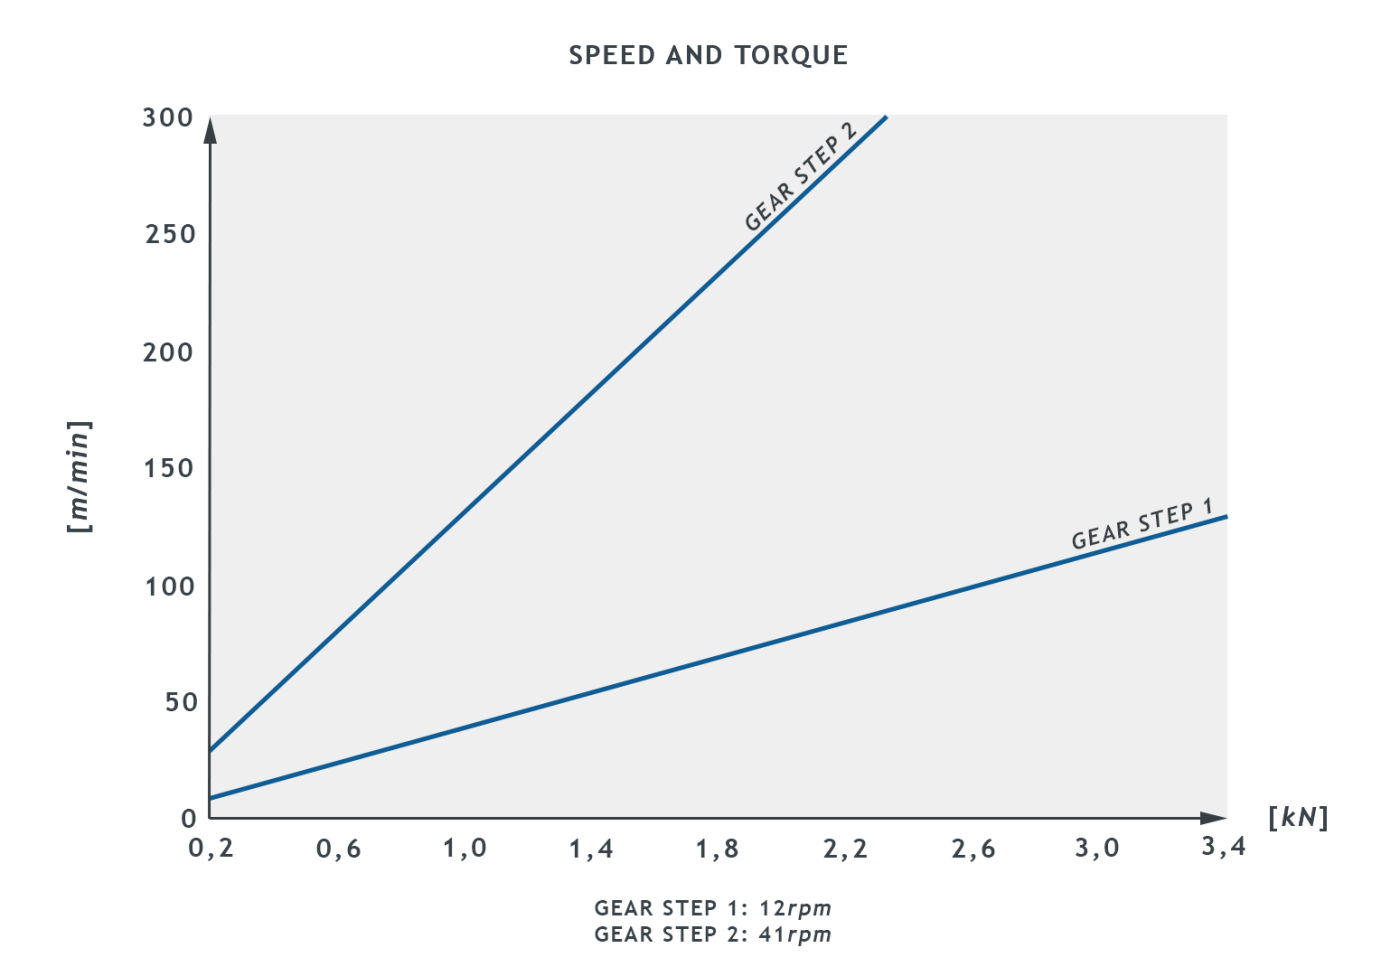 AVR20_SB0405005_SpeedTorque_graph1.jpg